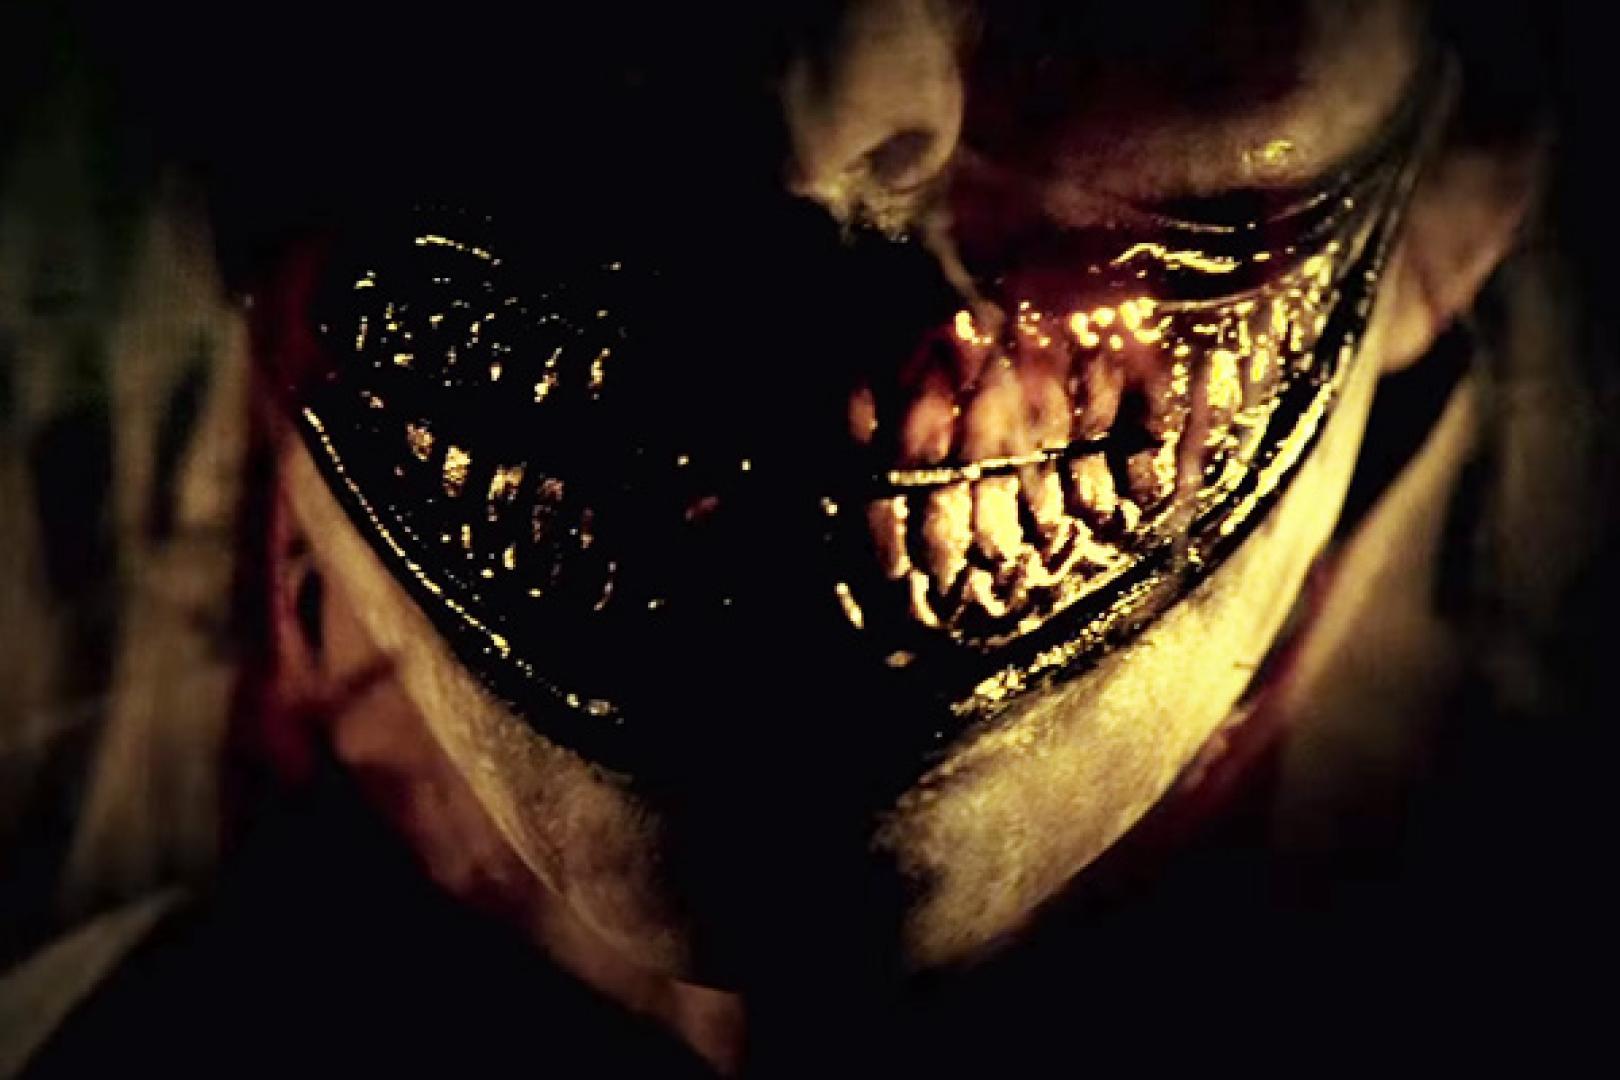 American Horror Story: Freak Show - 4x01